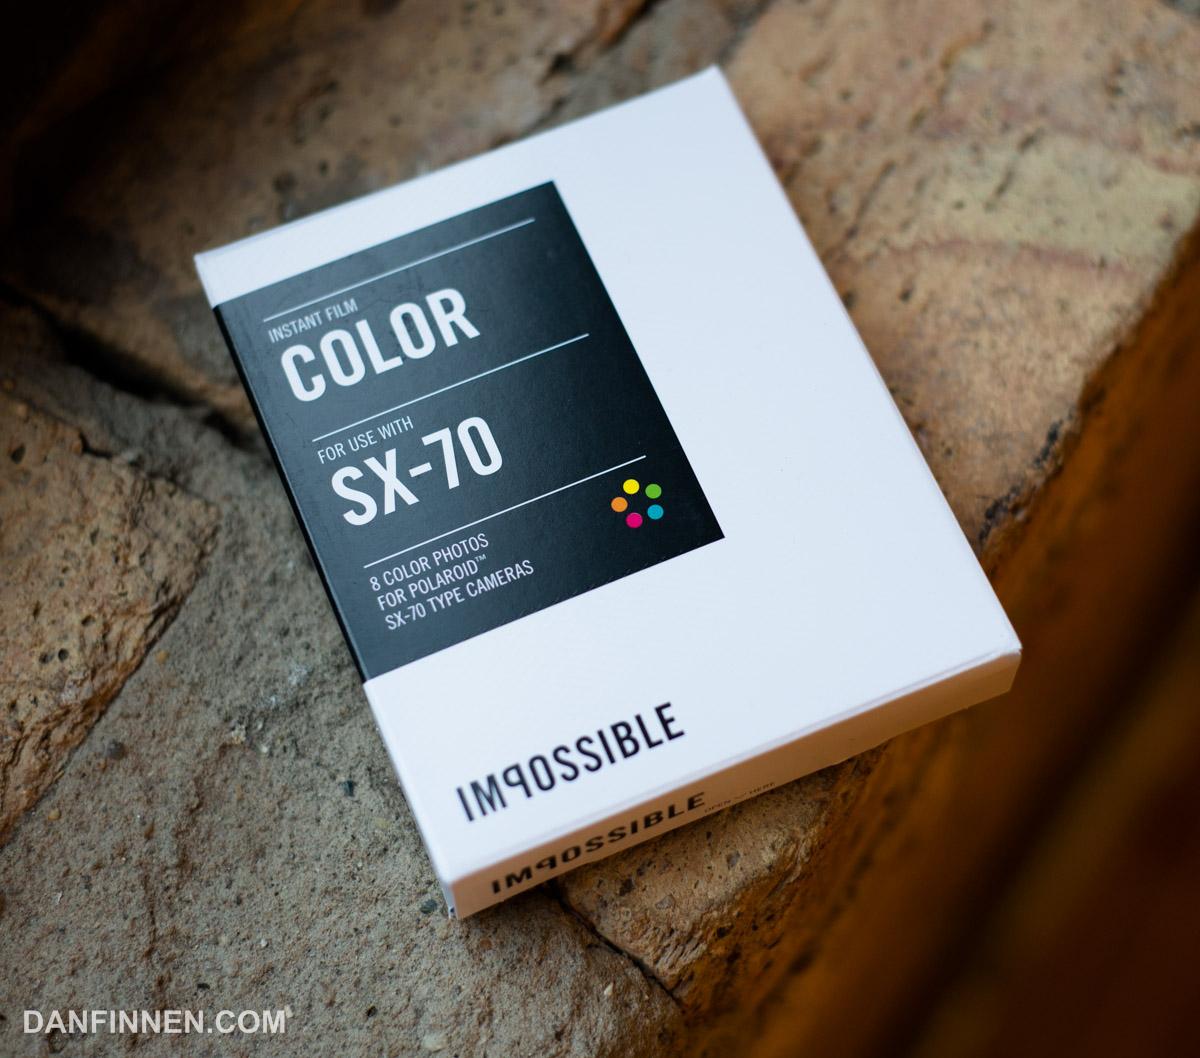 600 film & sx-70 | Polaroid SX 70 | Flickr